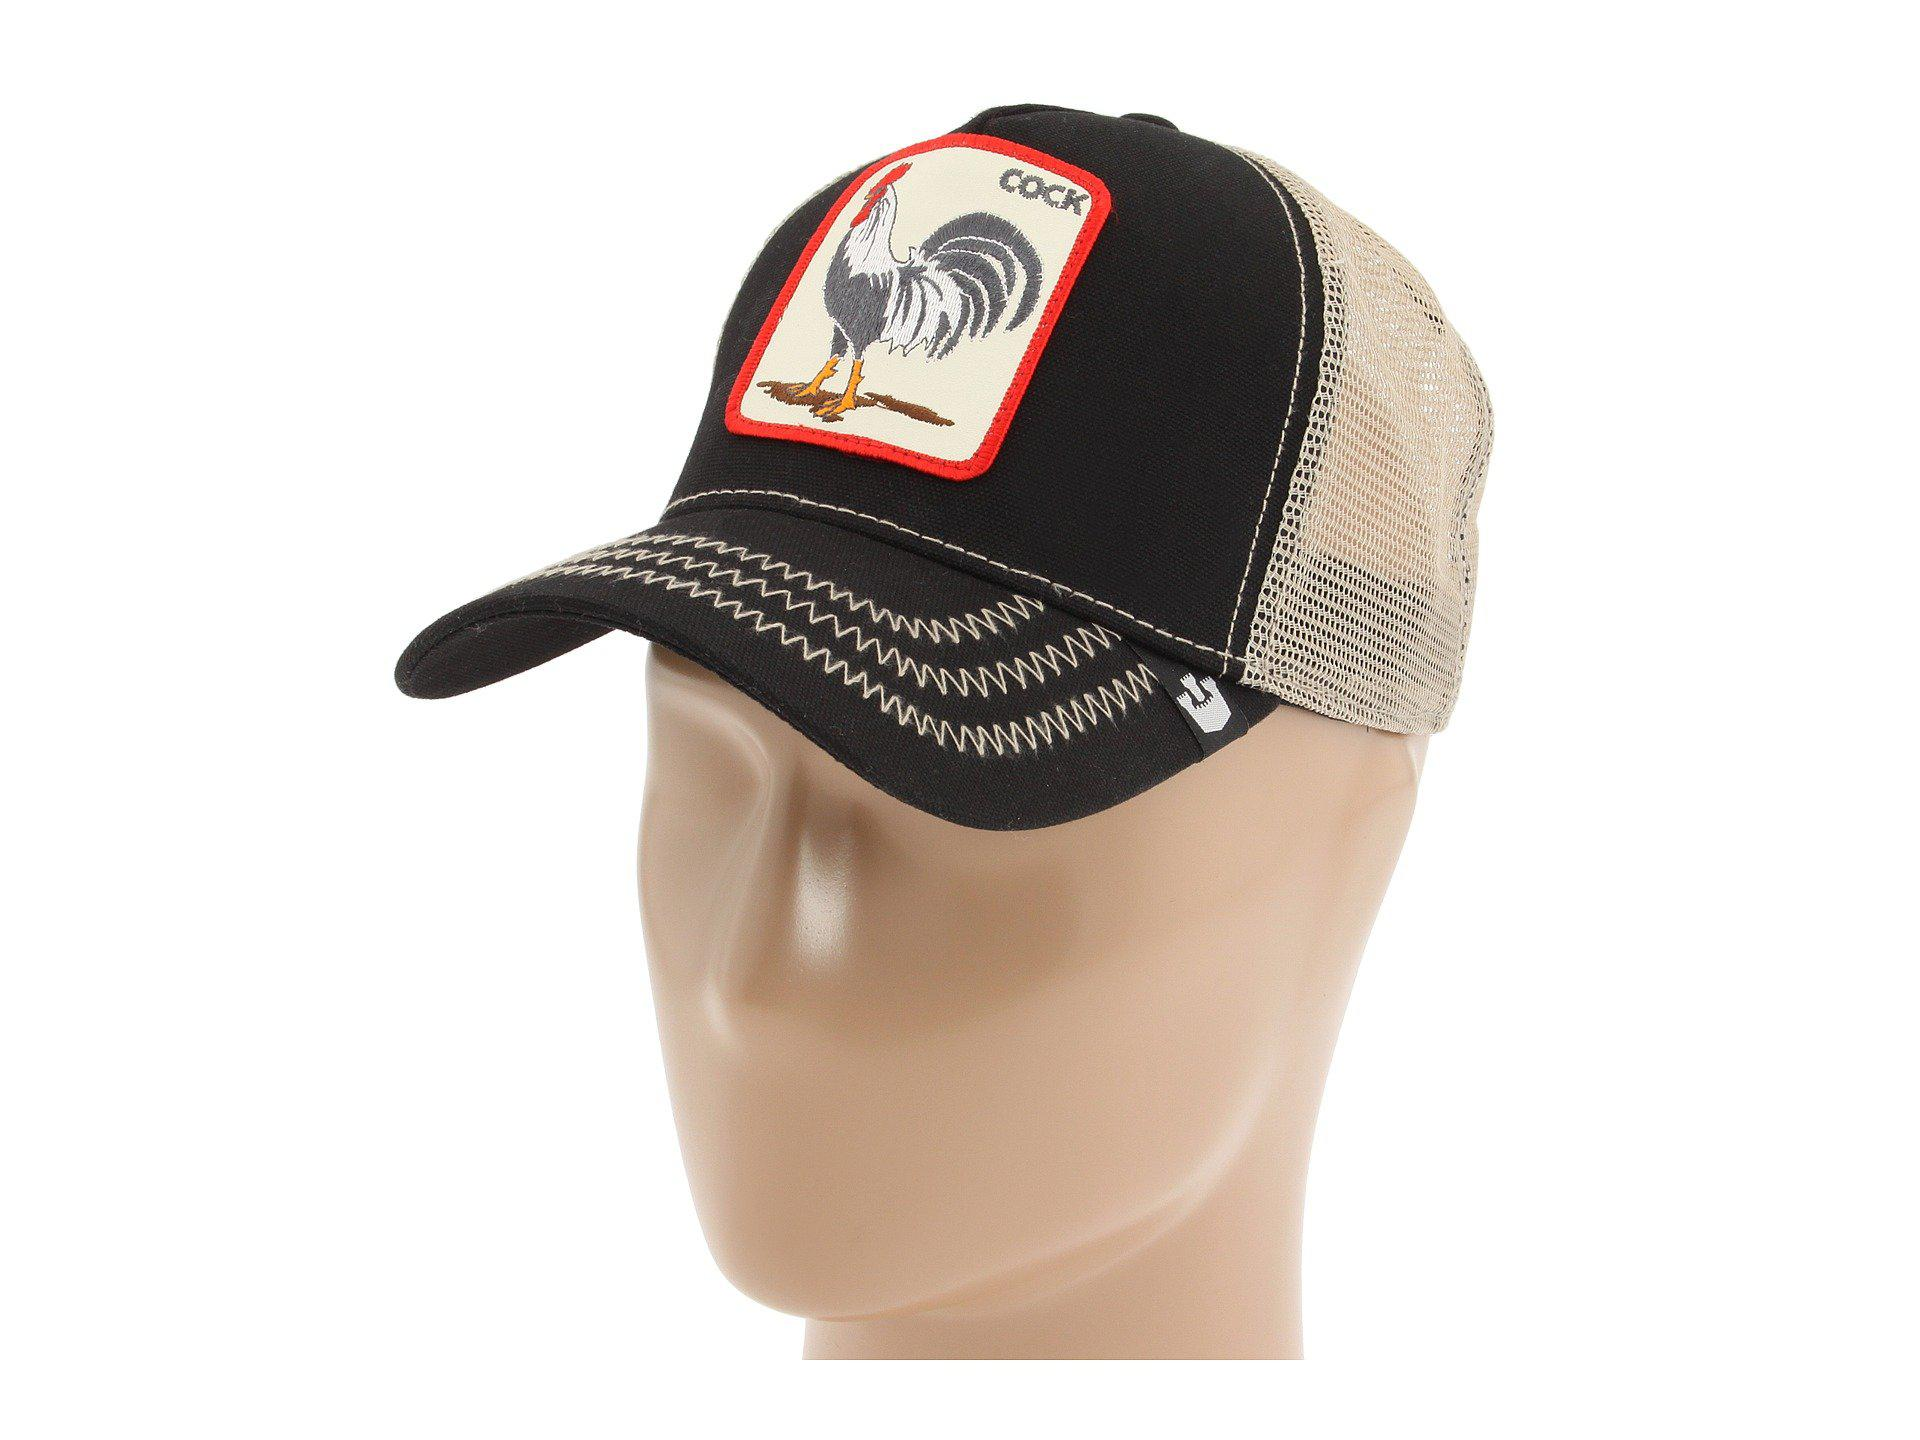 Lyst - Goorin Bros Animal Farm Snap Back Trucker Hat (brown Beaver ... 4c15defec2e2